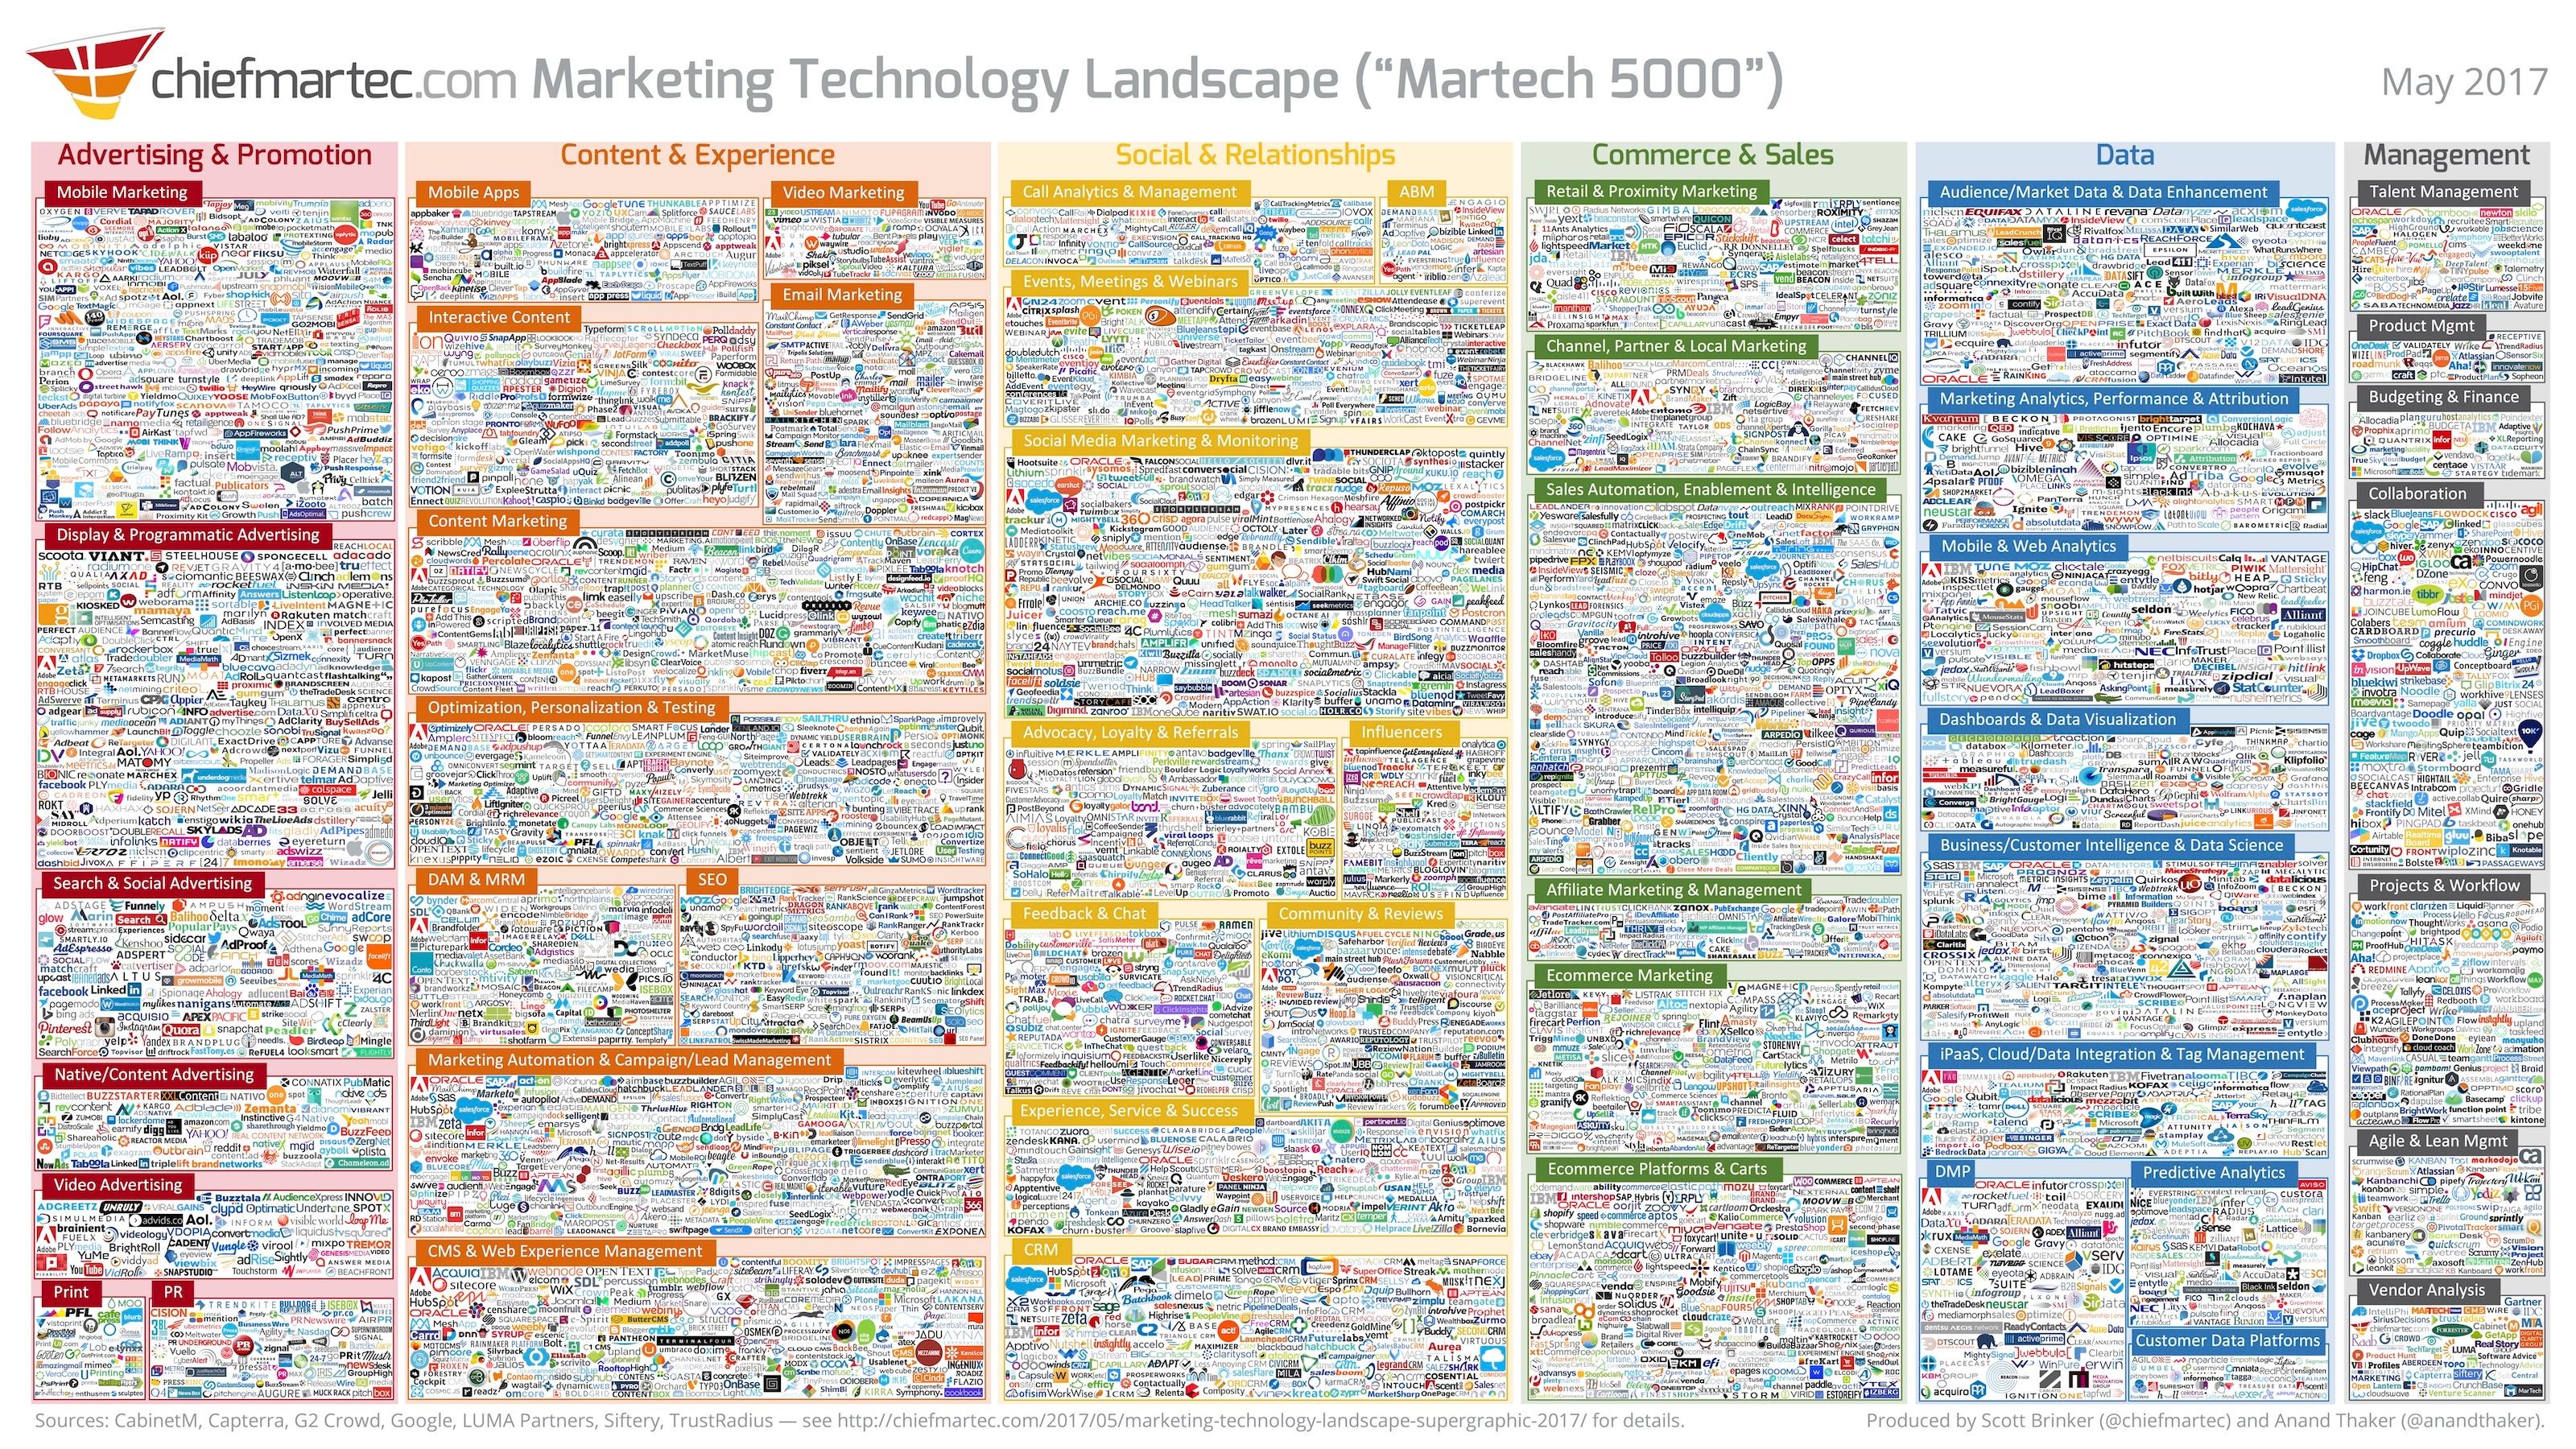 marketing_technology_landscape_chiefmartec